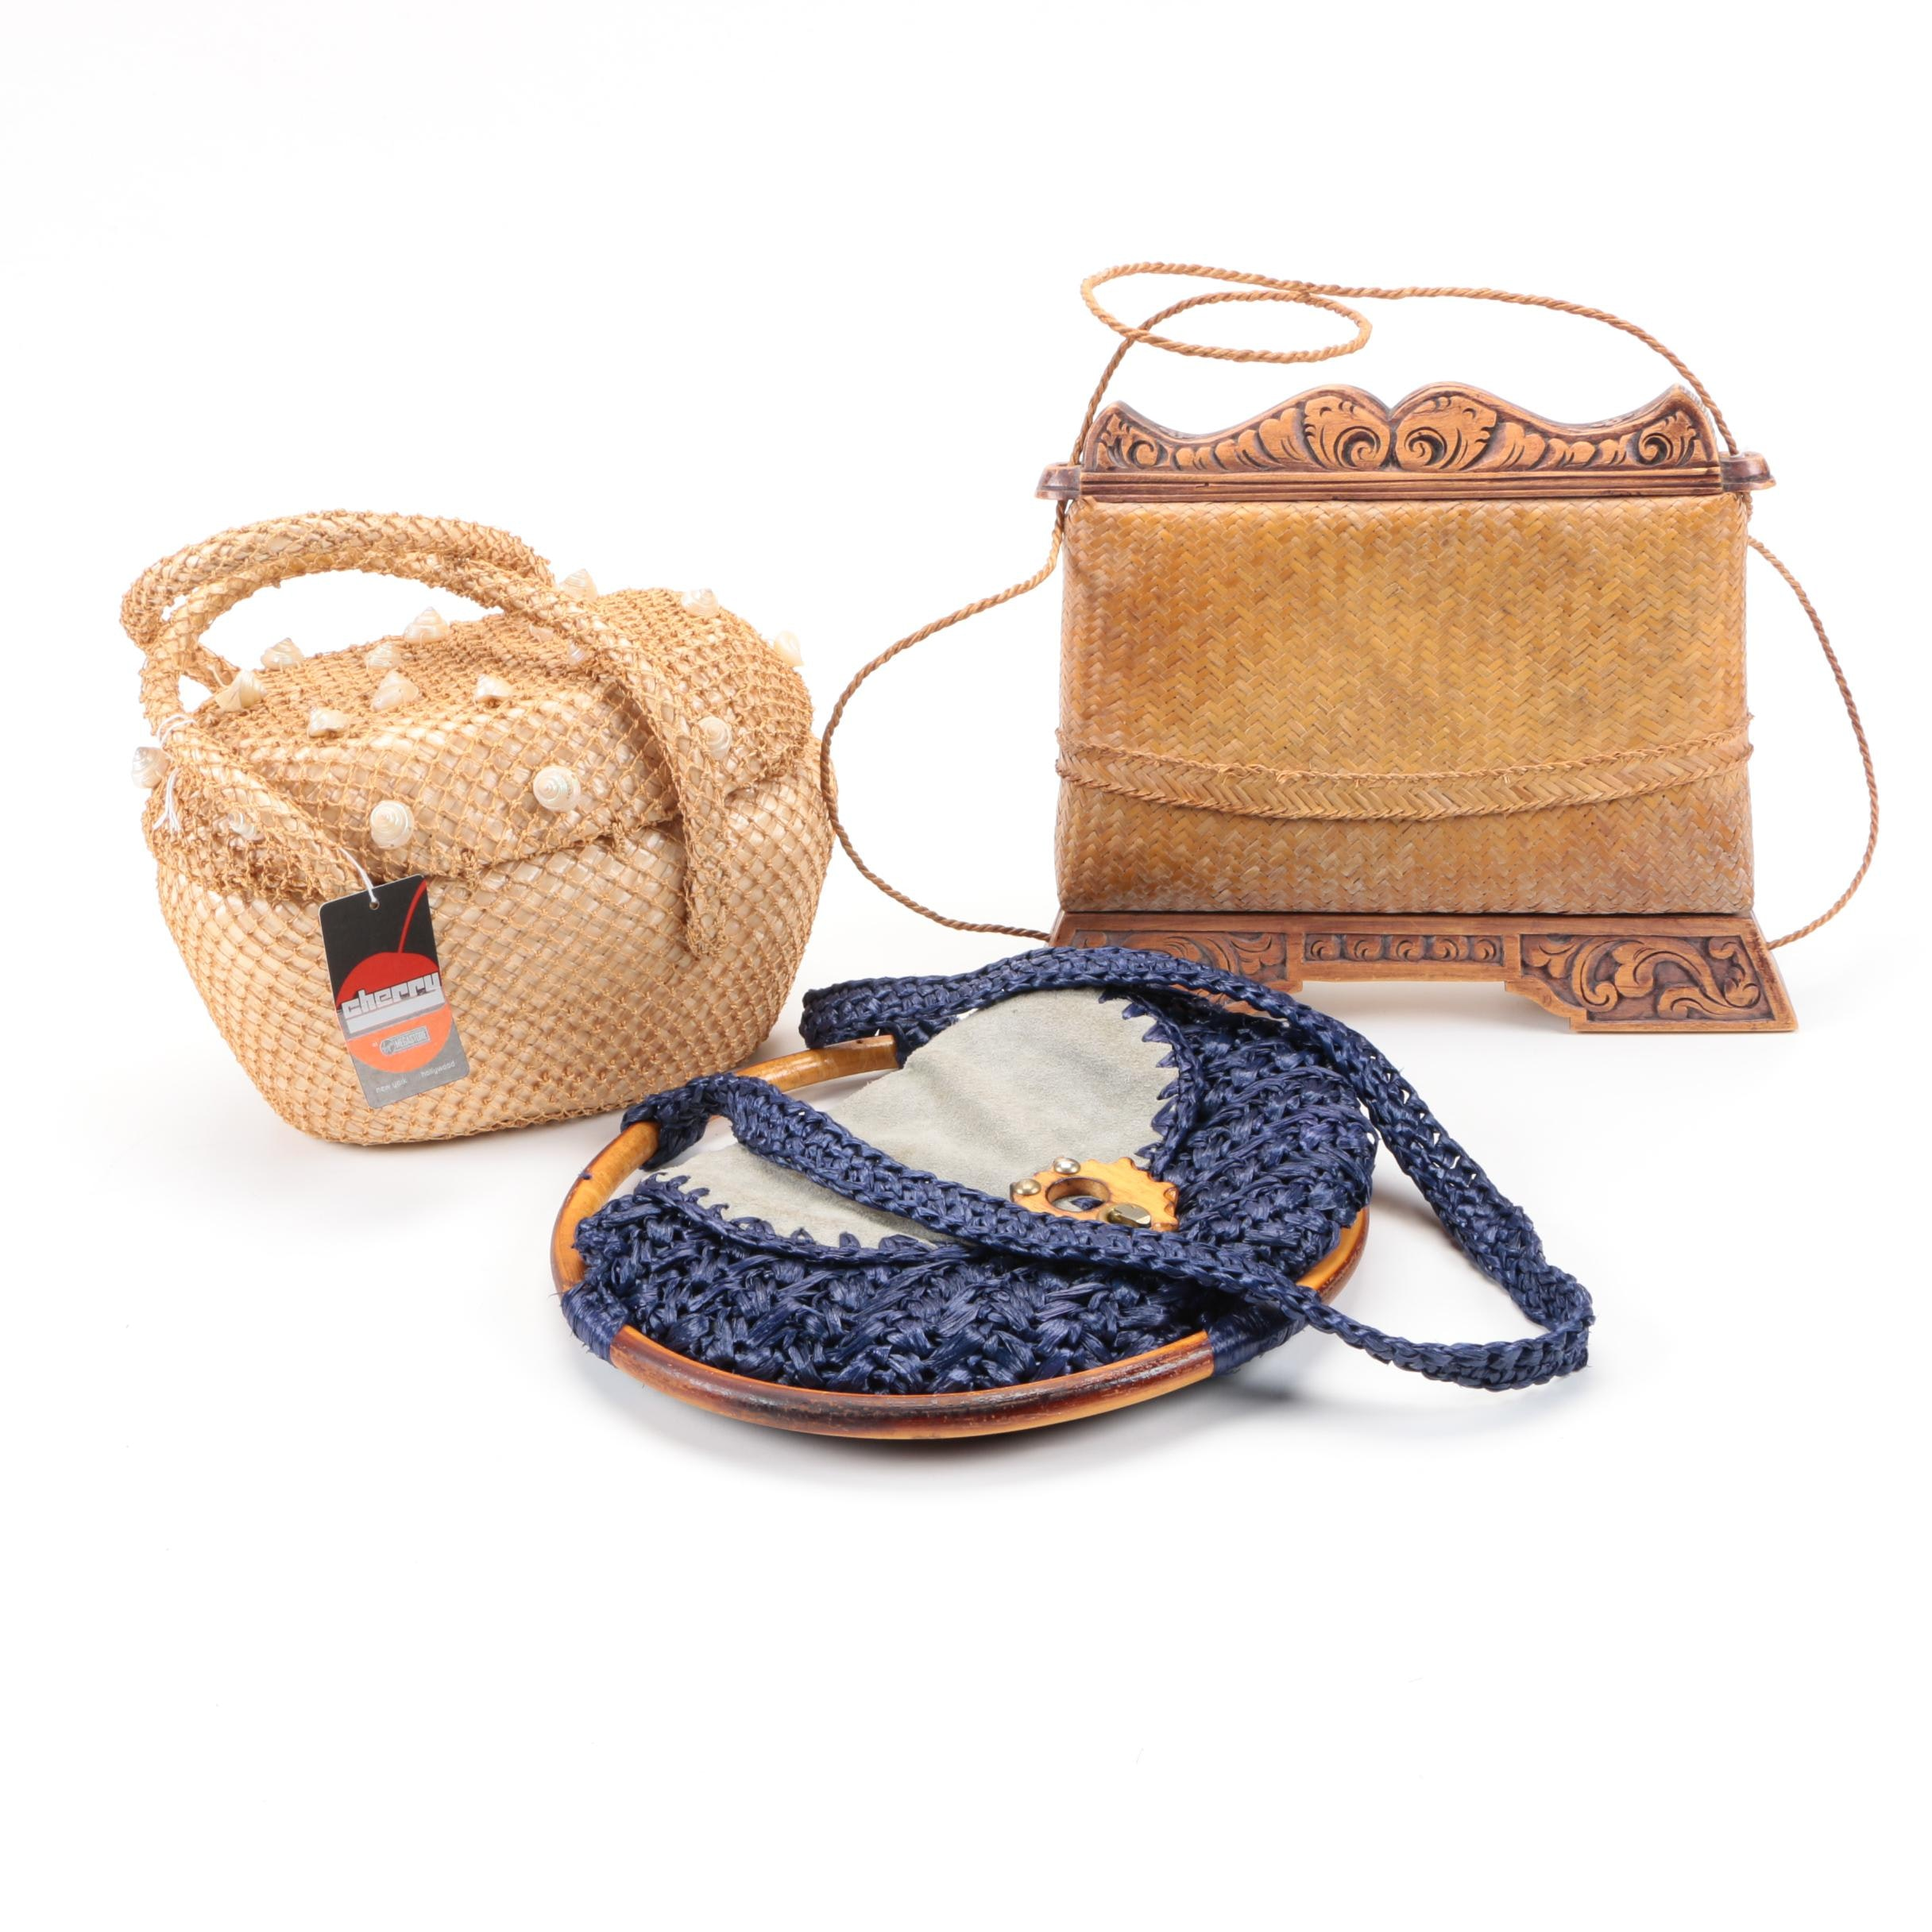 Vintage 1940s & 1950s Straw Handbags Including Josef